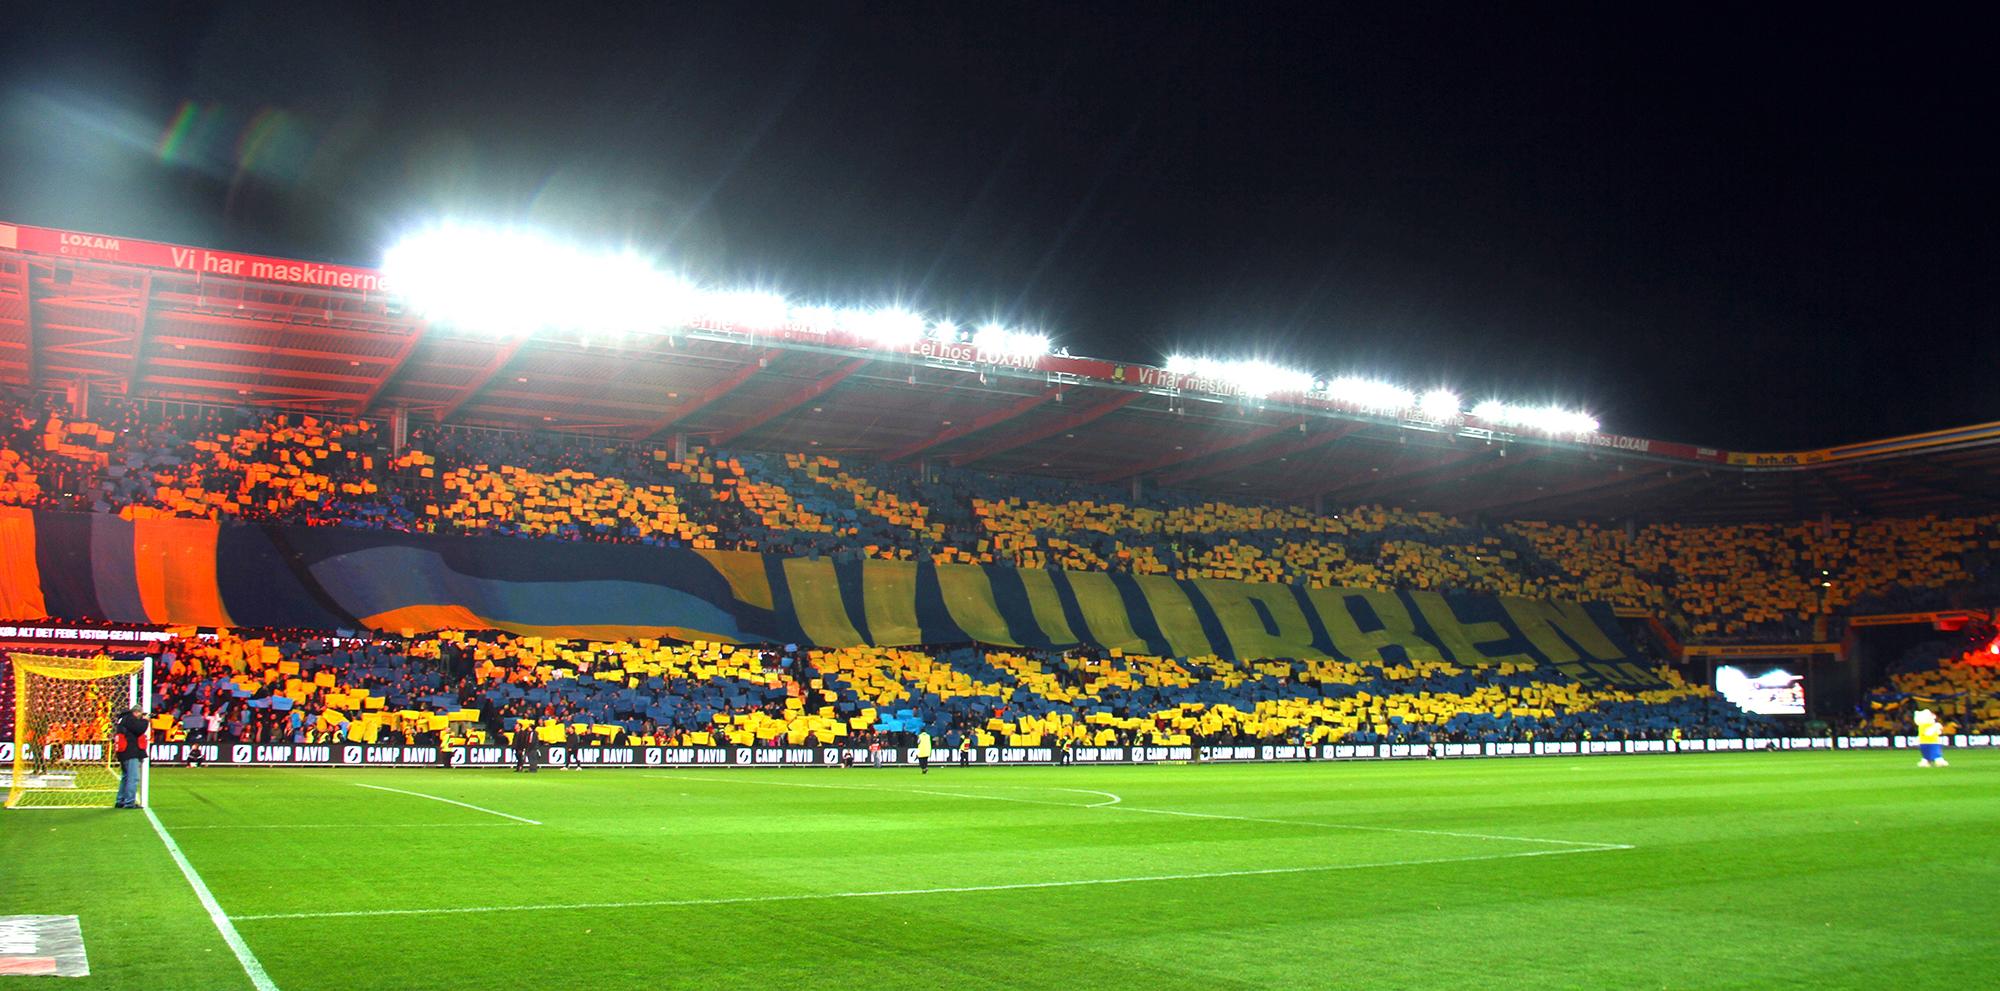 2015-11-08 (2)